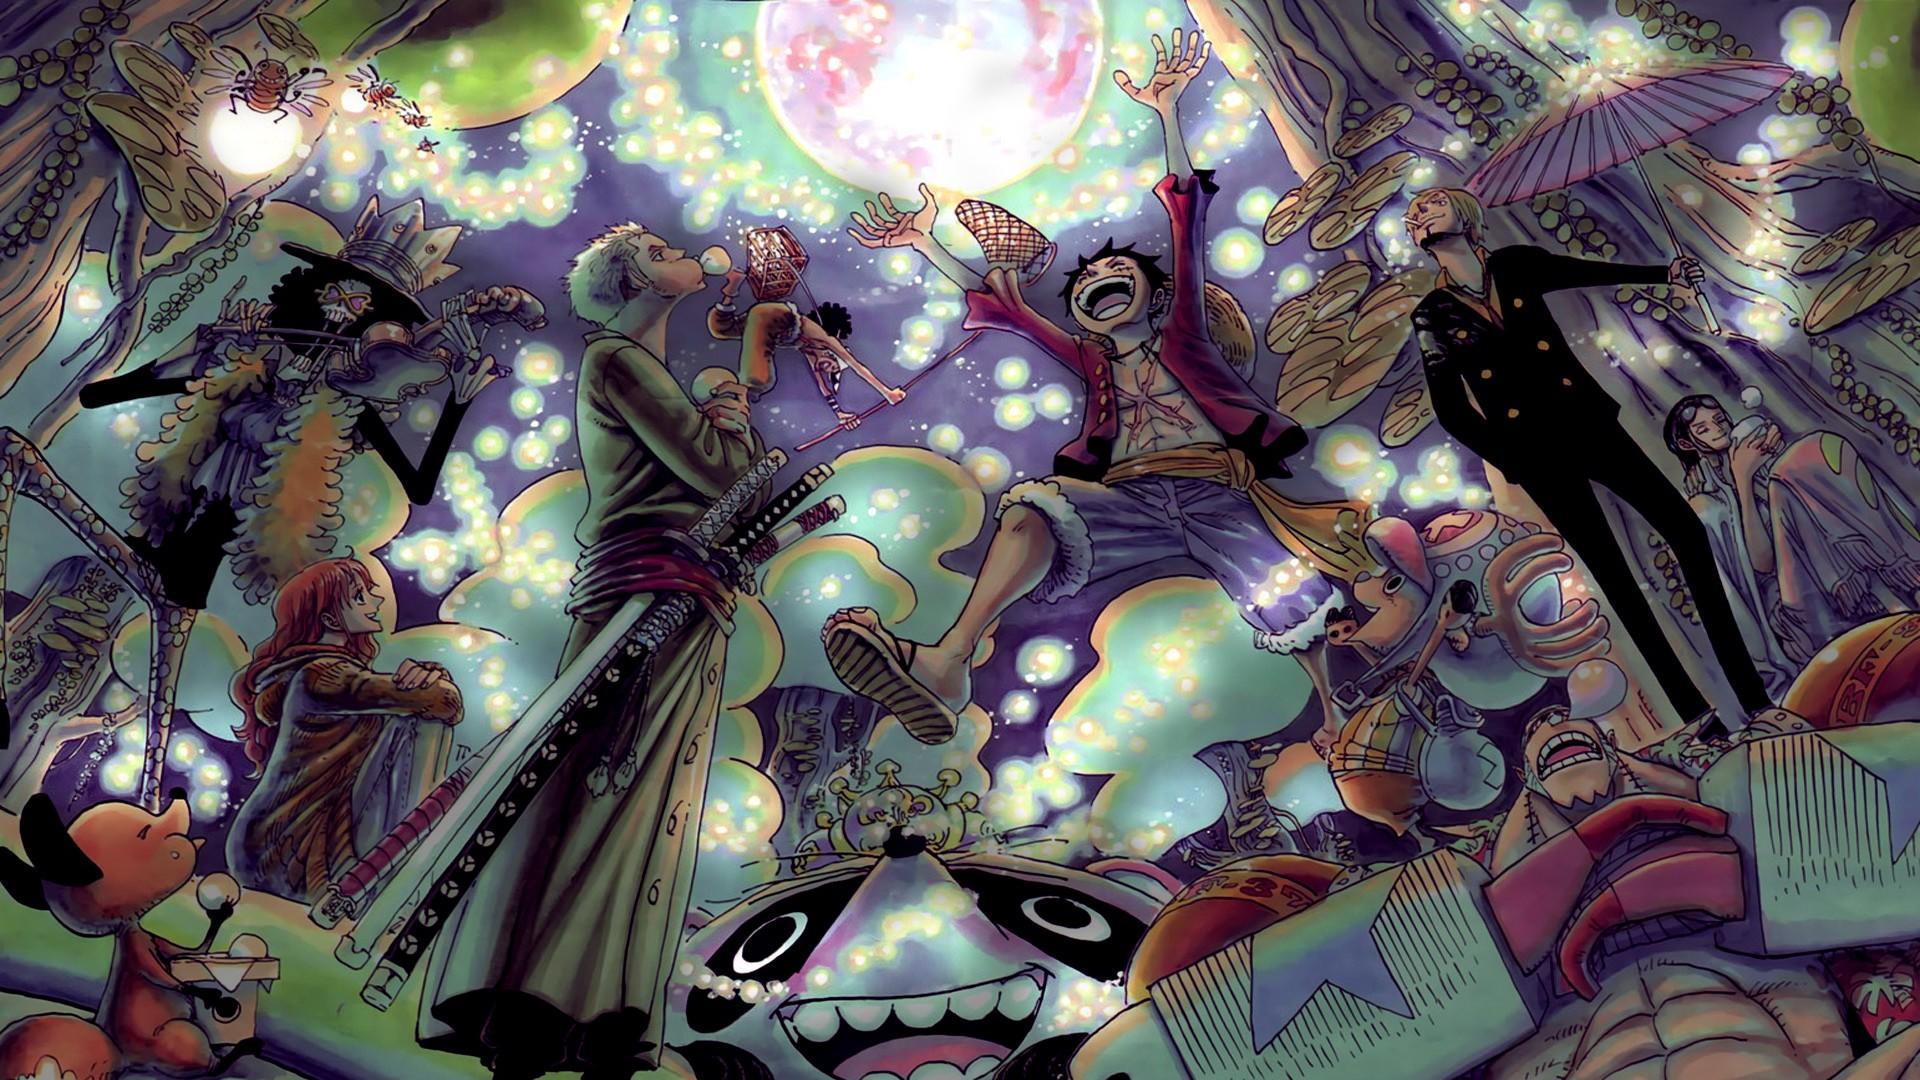 Tony Tony Chopper Wallpaper Hd One Piece Full Hd Wallpaper And Background Image